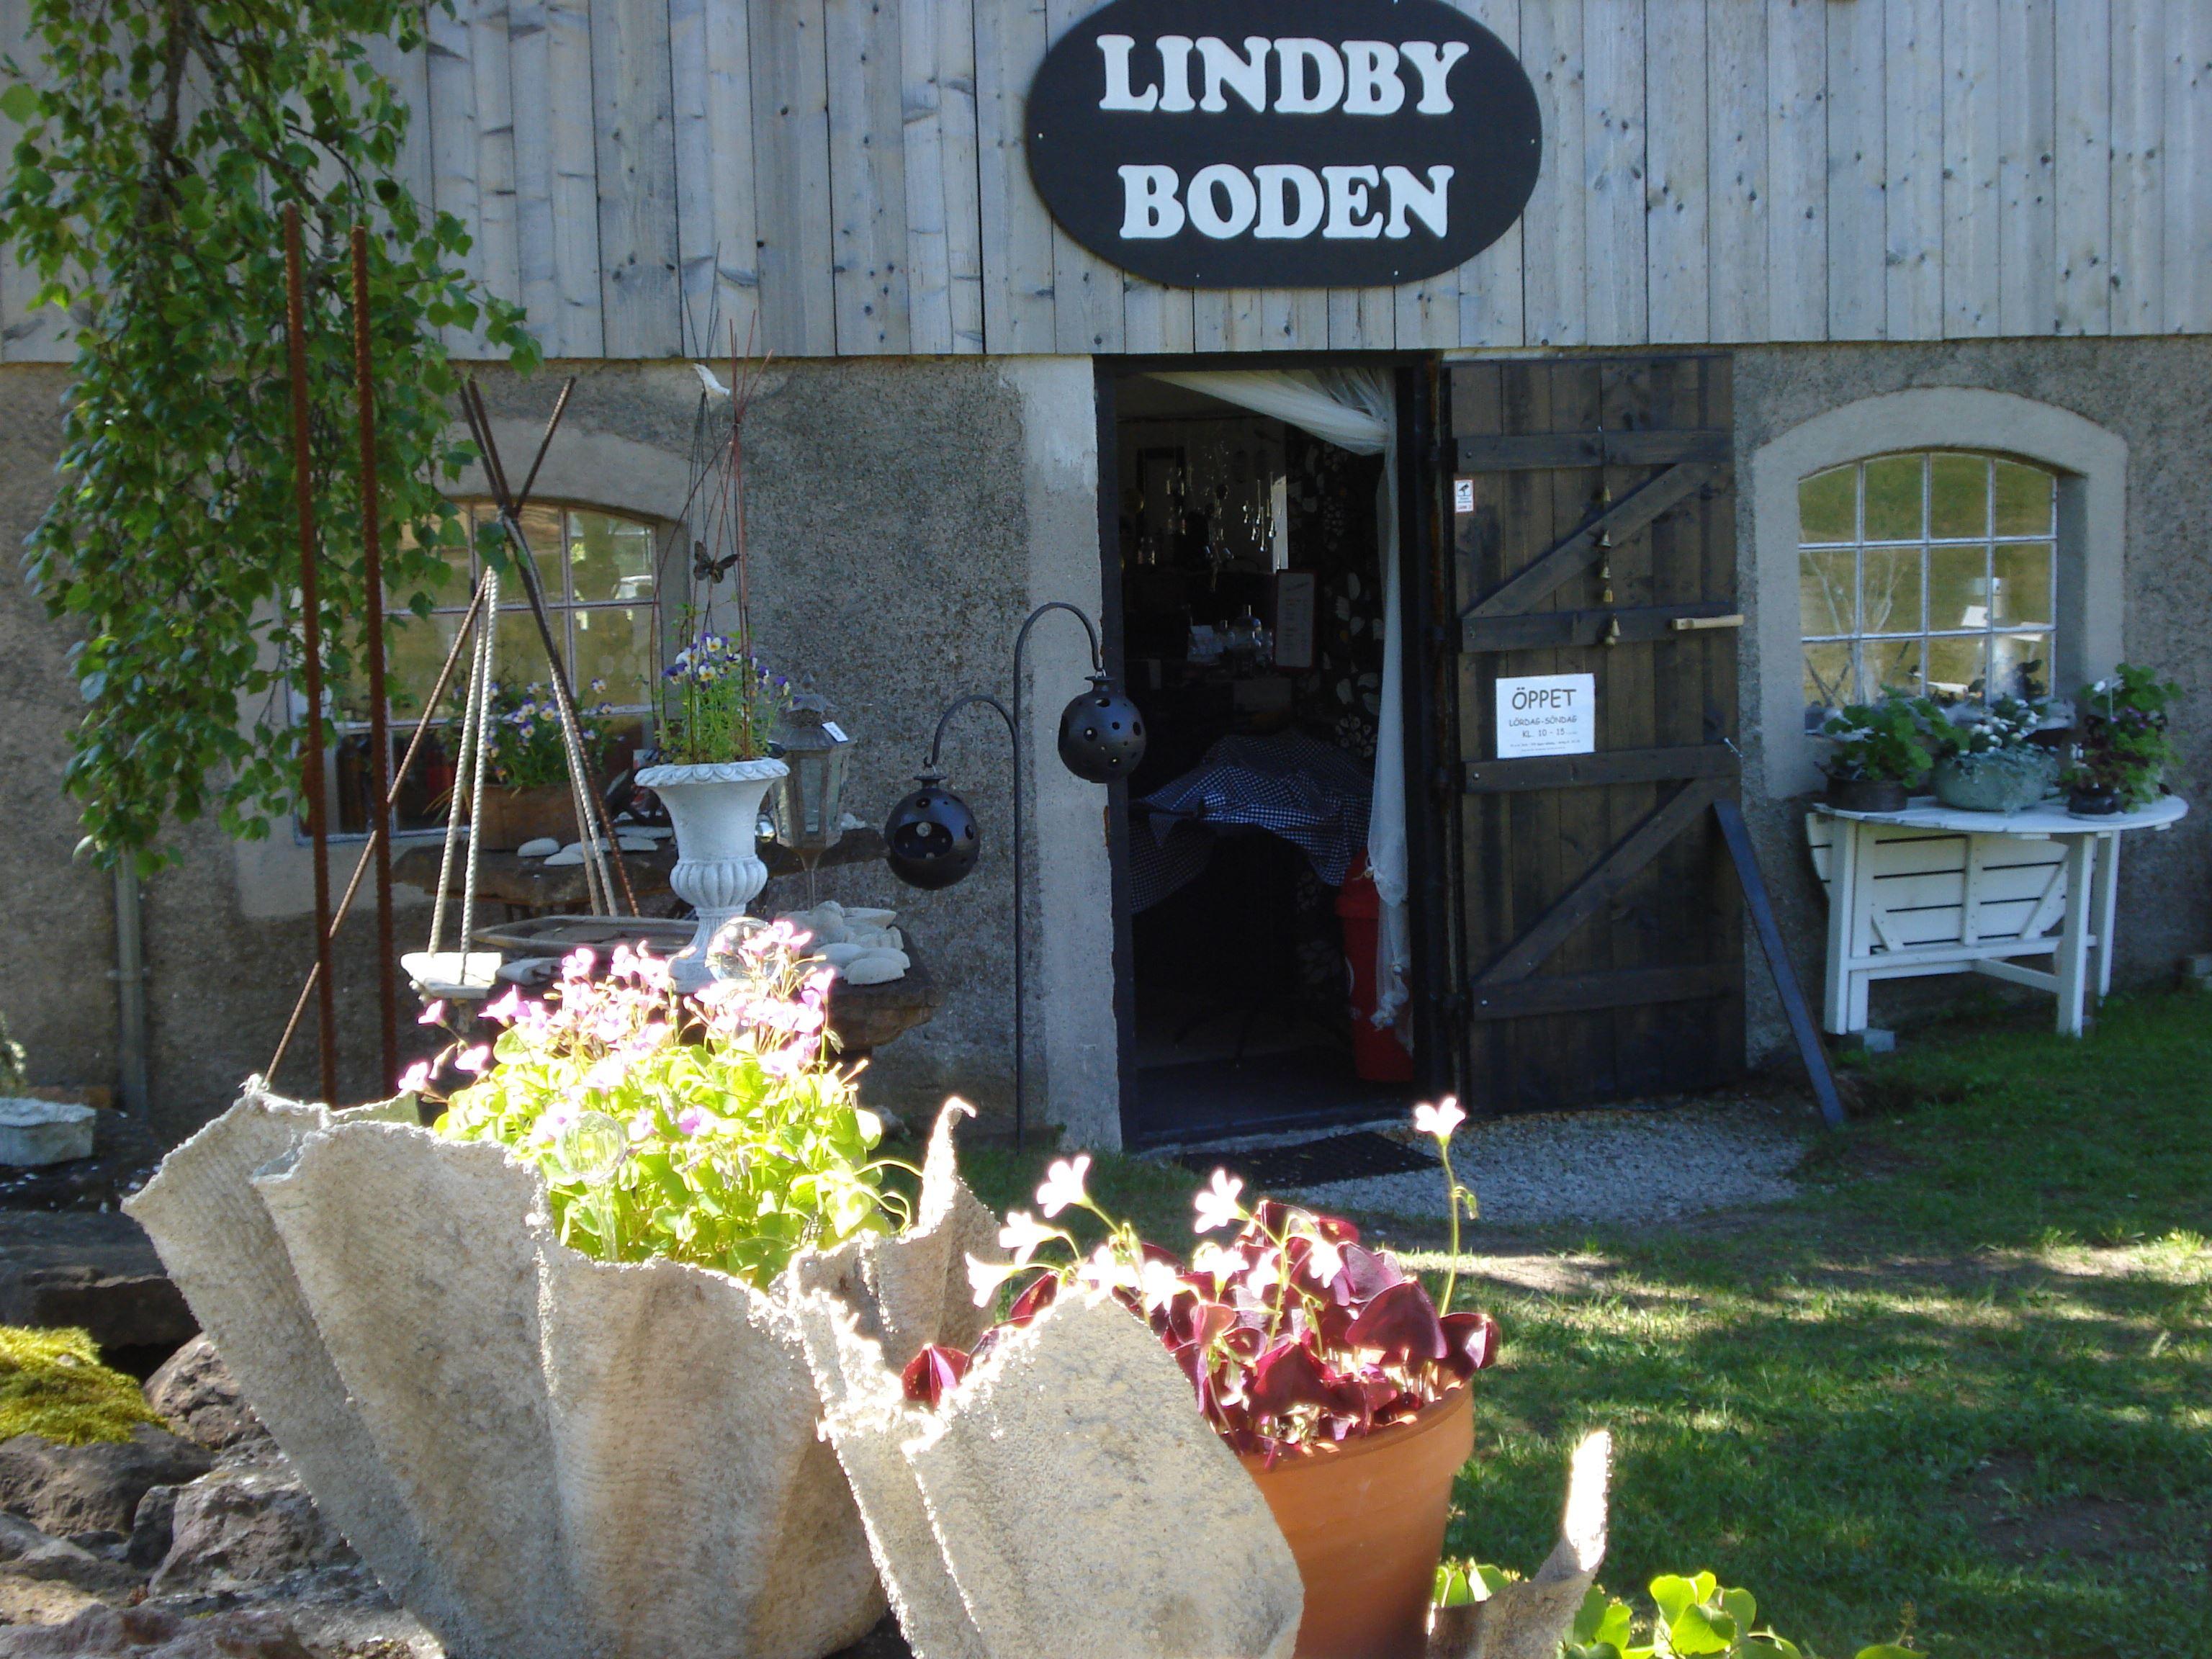 Lindbyboden - Lindby